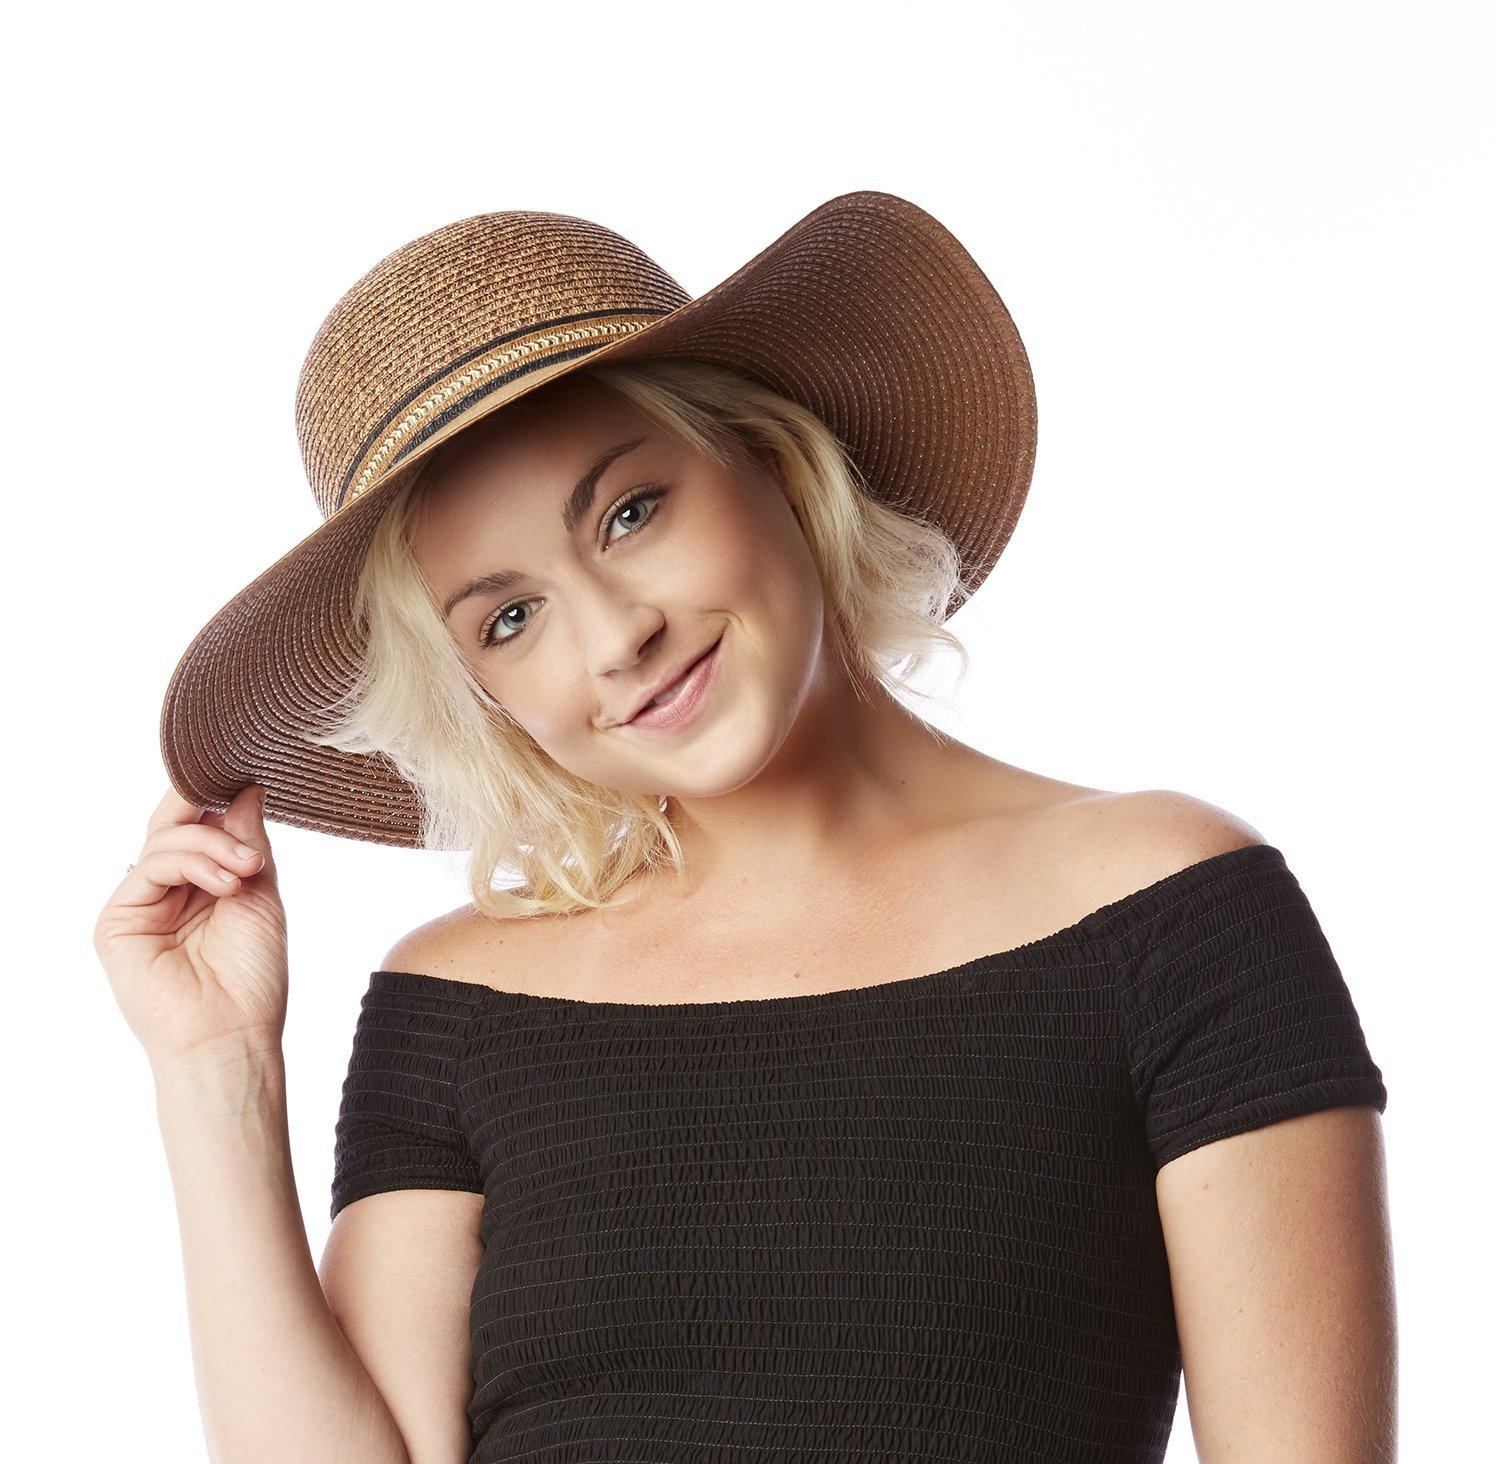 rainiersun sombrero de Maya de mujer Screamer 1333 472c0d3cd3a